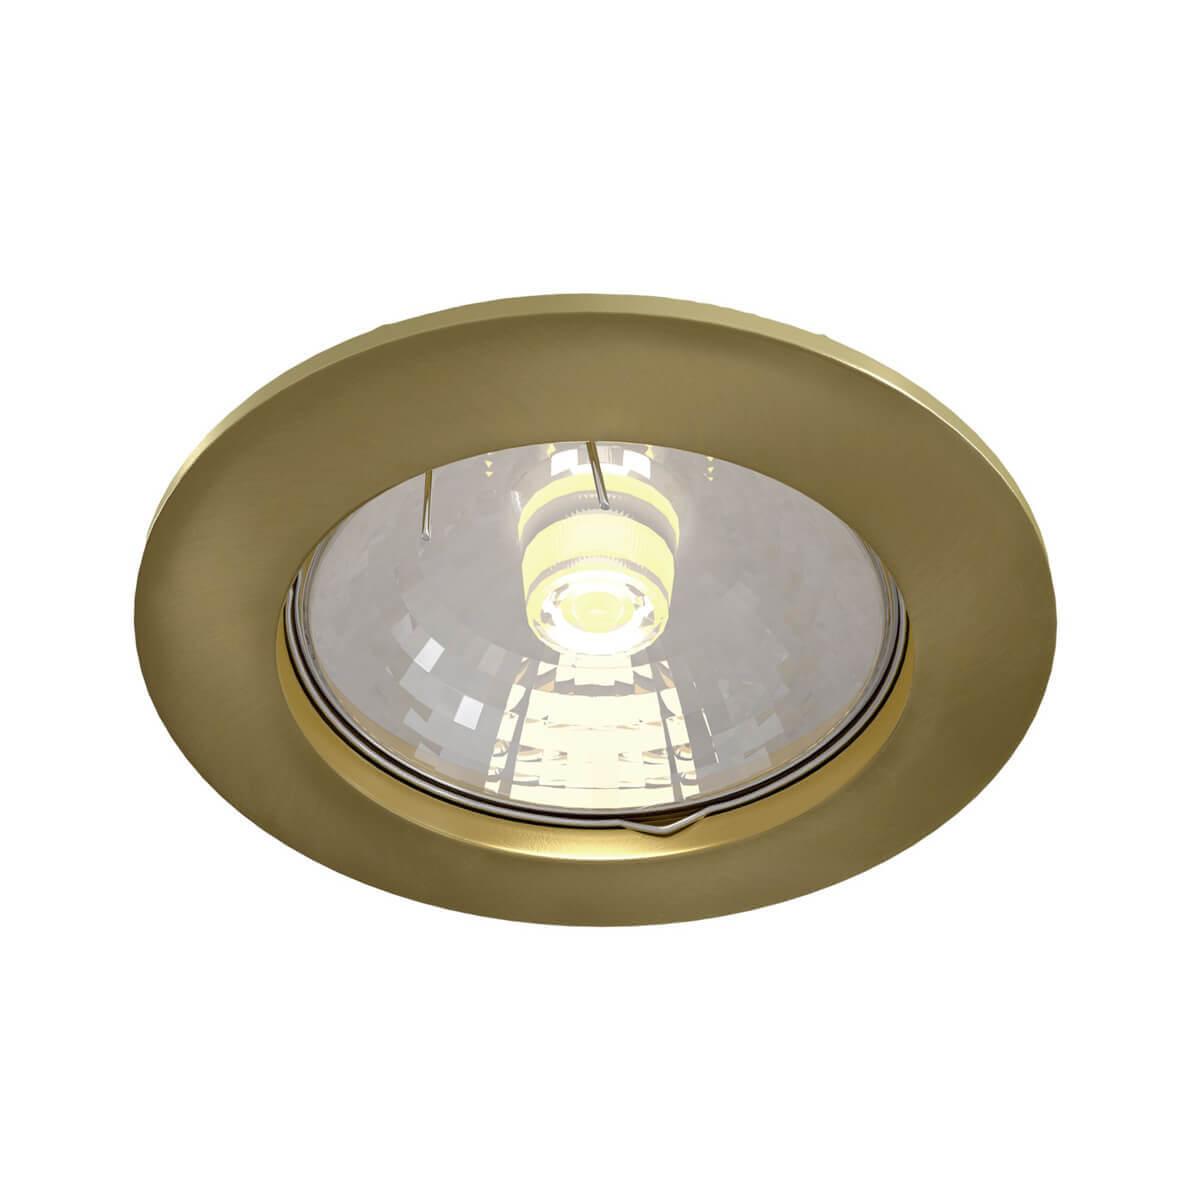 Светильник Maytoni DL009-2-01-BZ Metal DL009